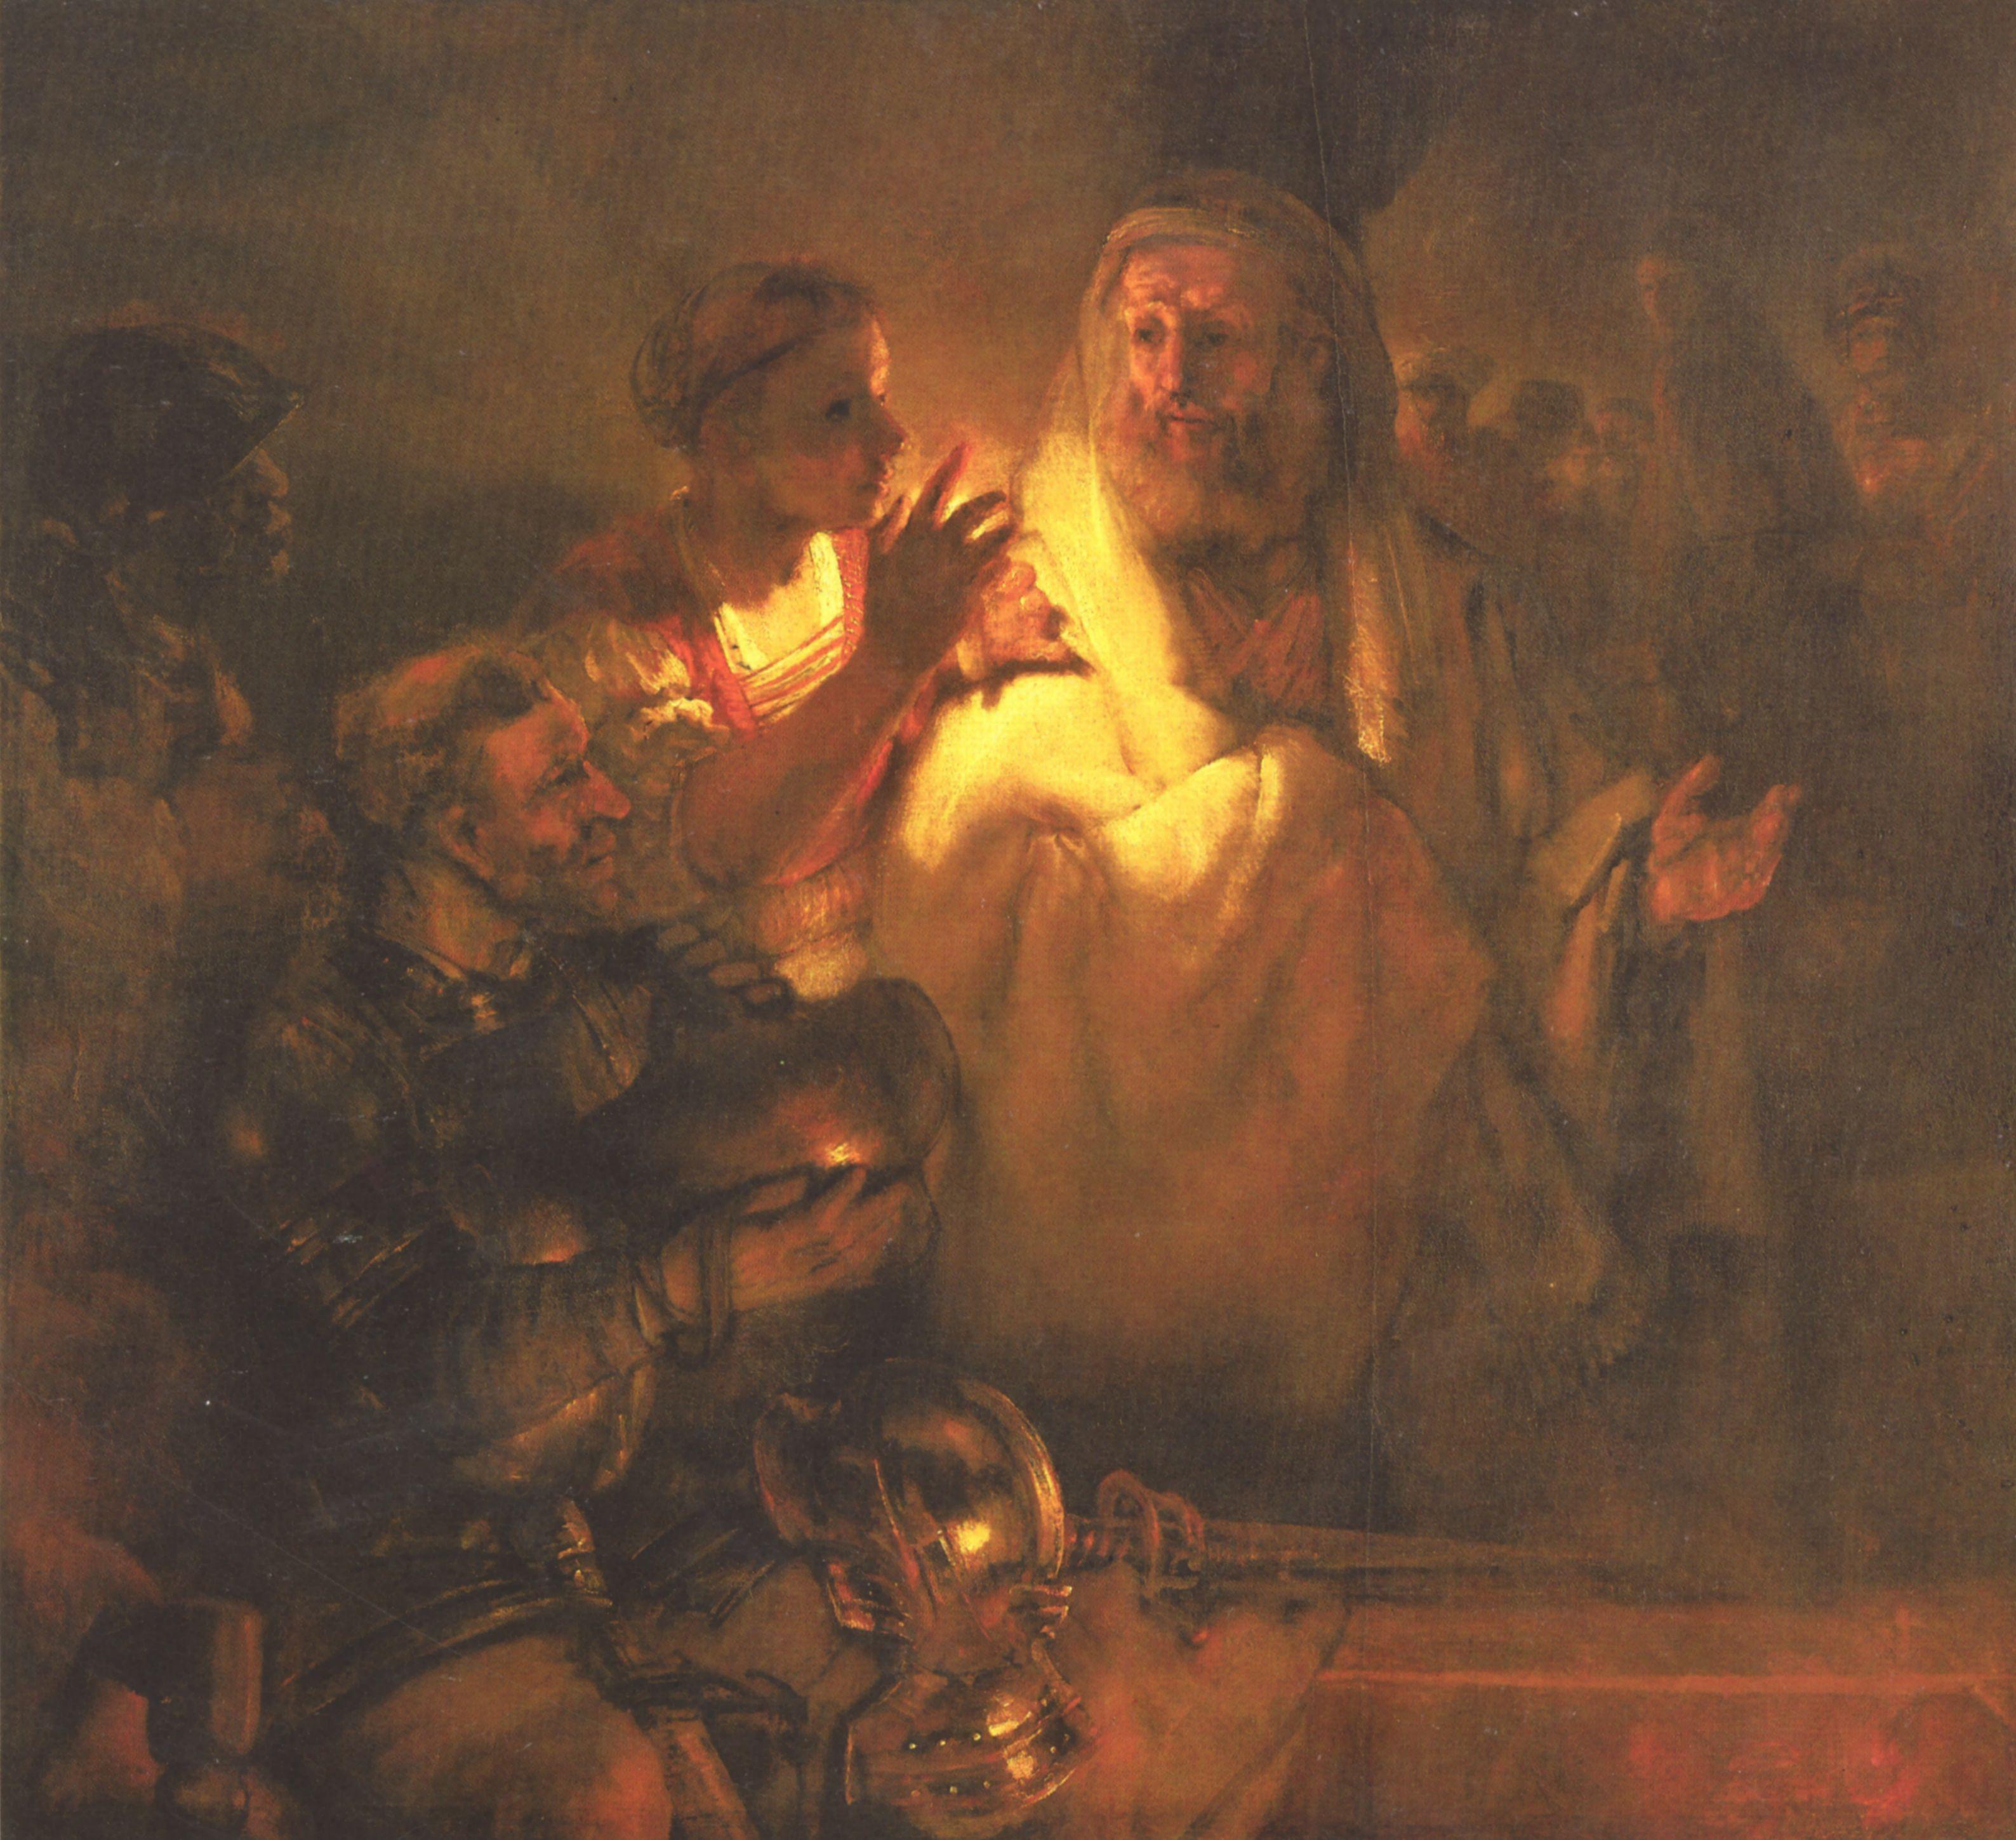 http://www.malerei-meisterwerke.de/images_large/rembrandt-harmensz.-van-rijn-apostel-petrus-verleugnet-christus-07972.jpg